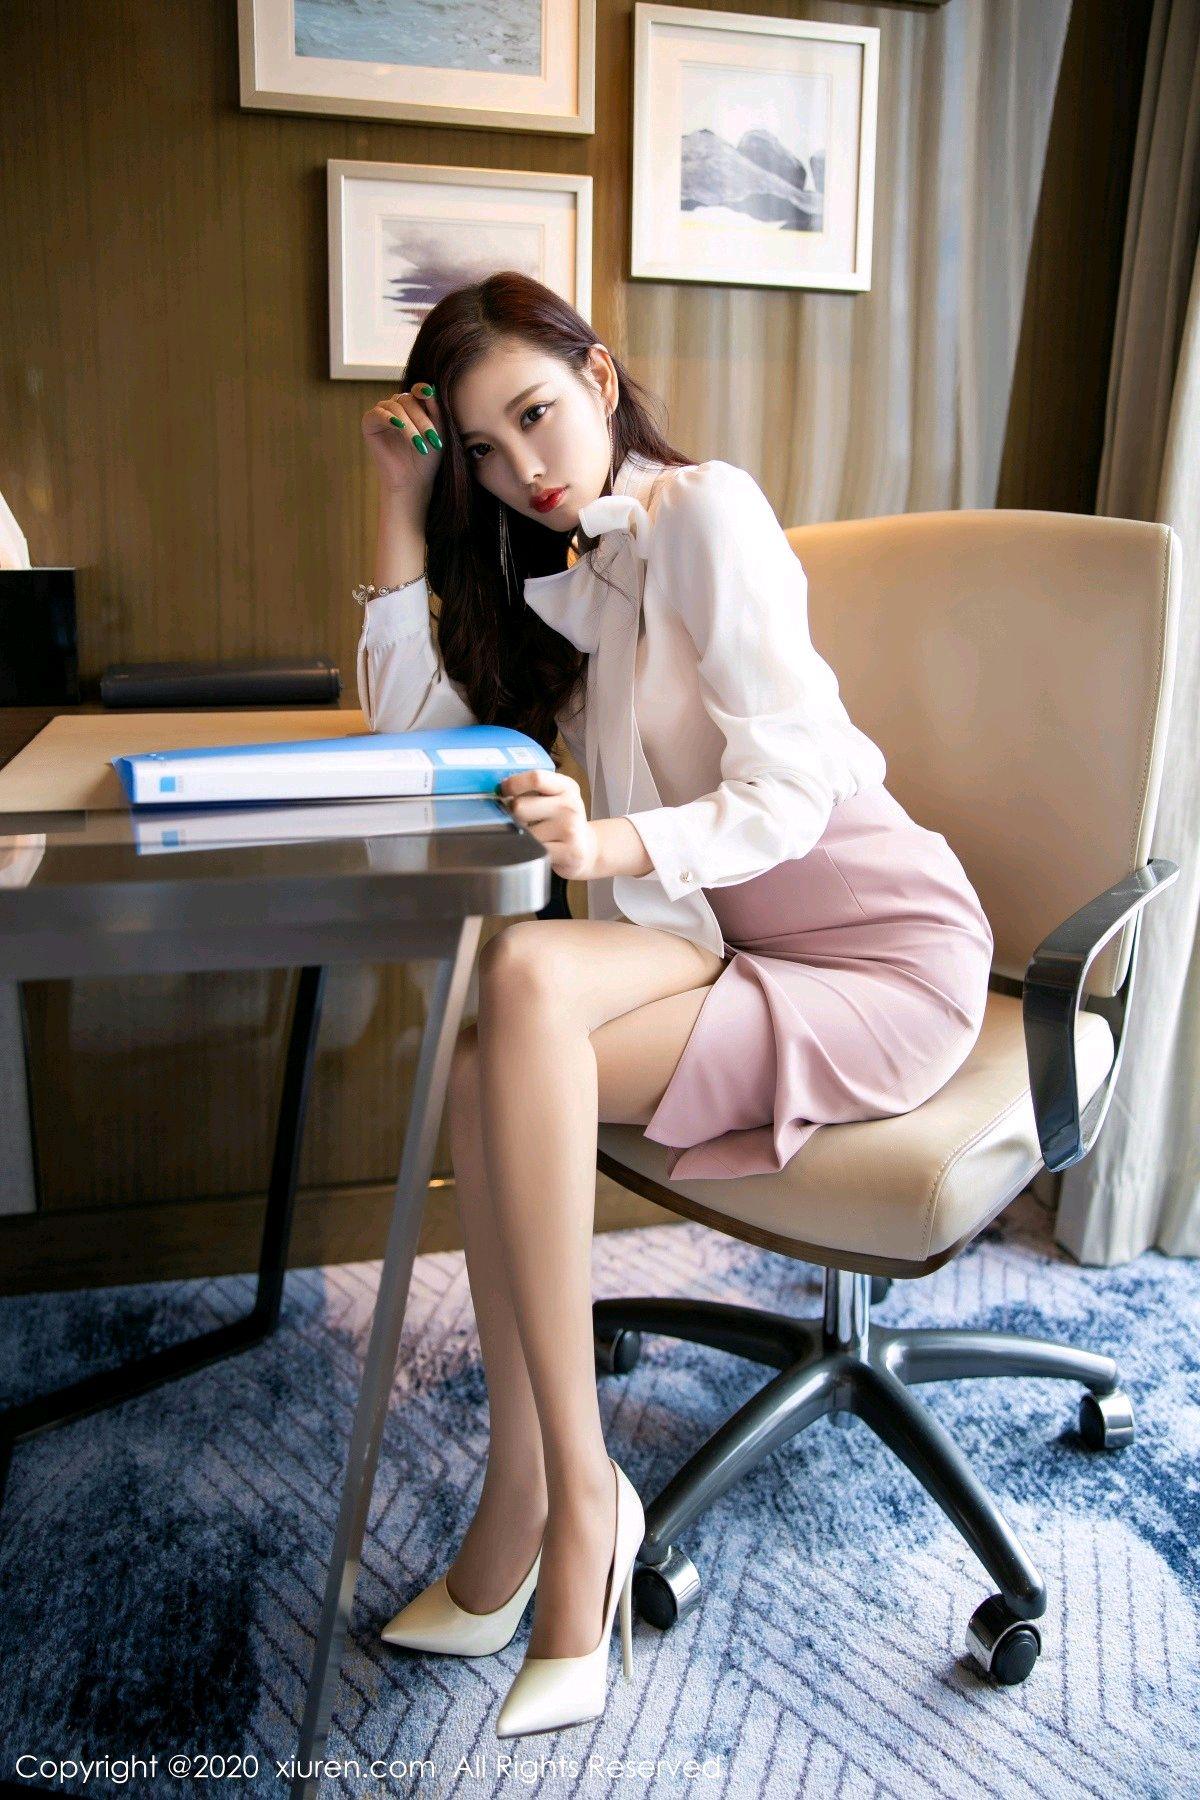 [XiuRen] Vol.2431 Yang Chen Chen 1P, Tall, Underwear, Uniform, Xiuren, Yang Chen Chen